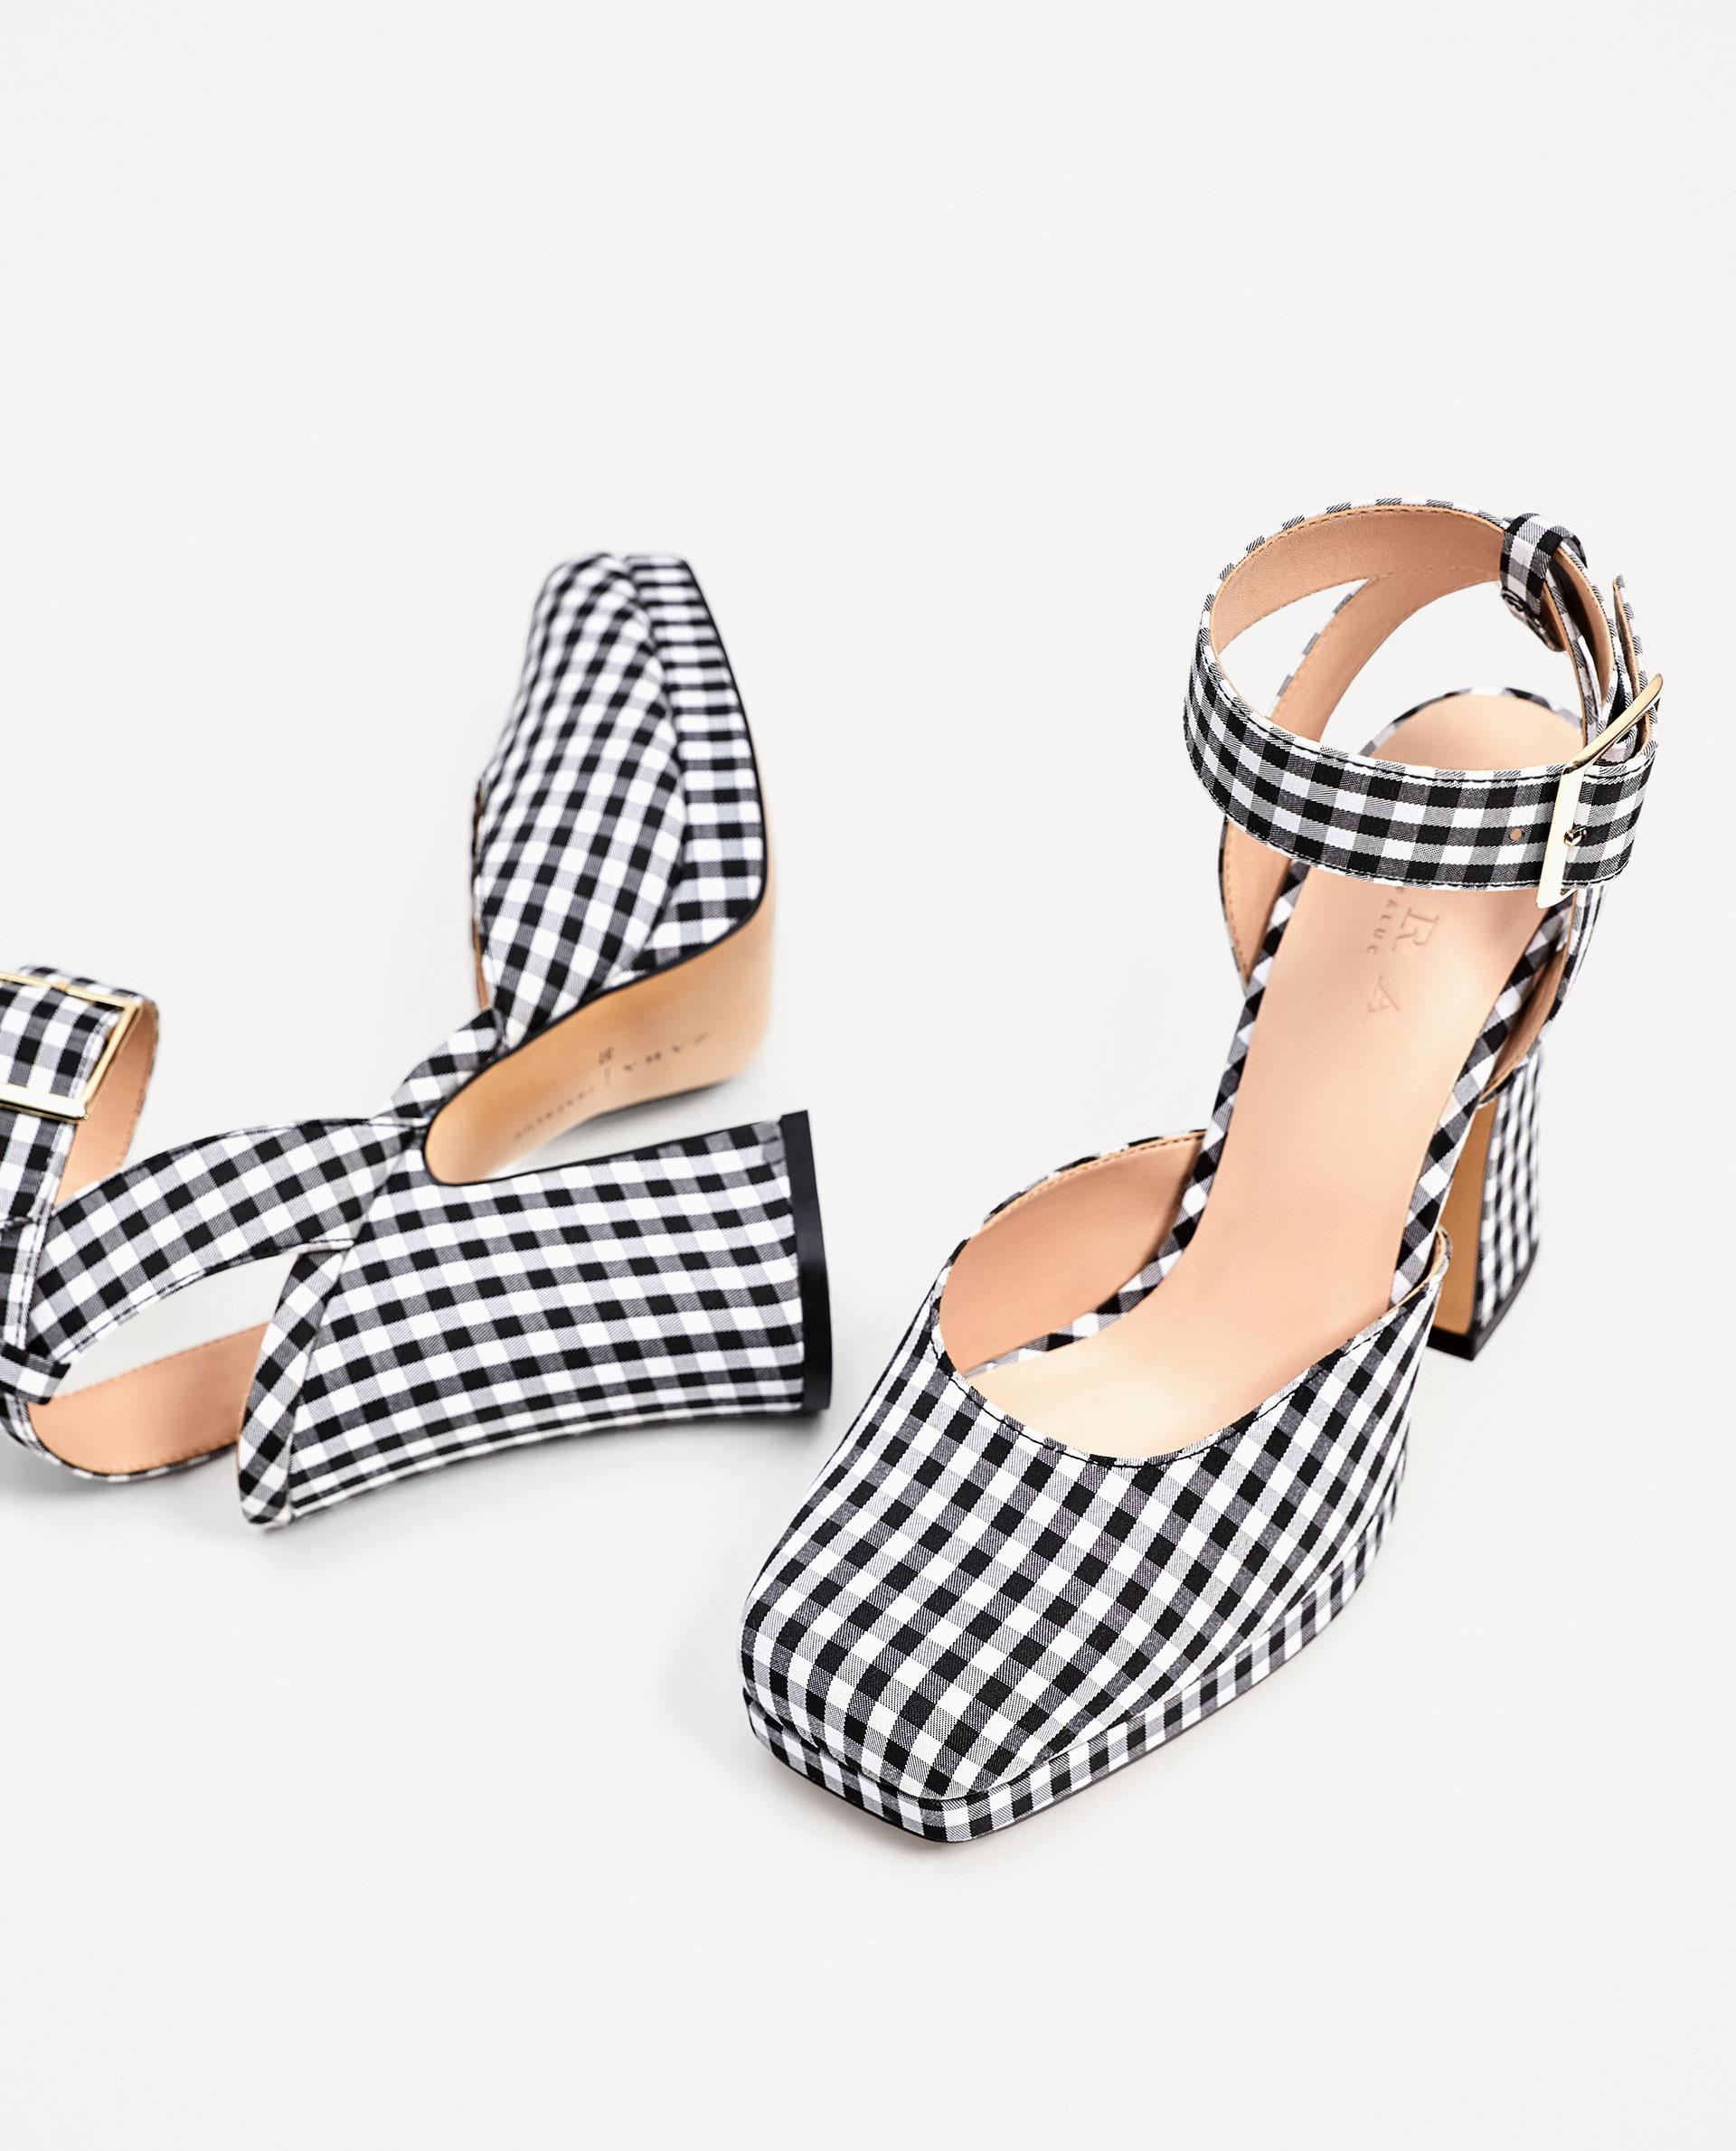 Tα παπούτσια της Bella Hadid κοστίζουν μόνο 40 Ευρώ